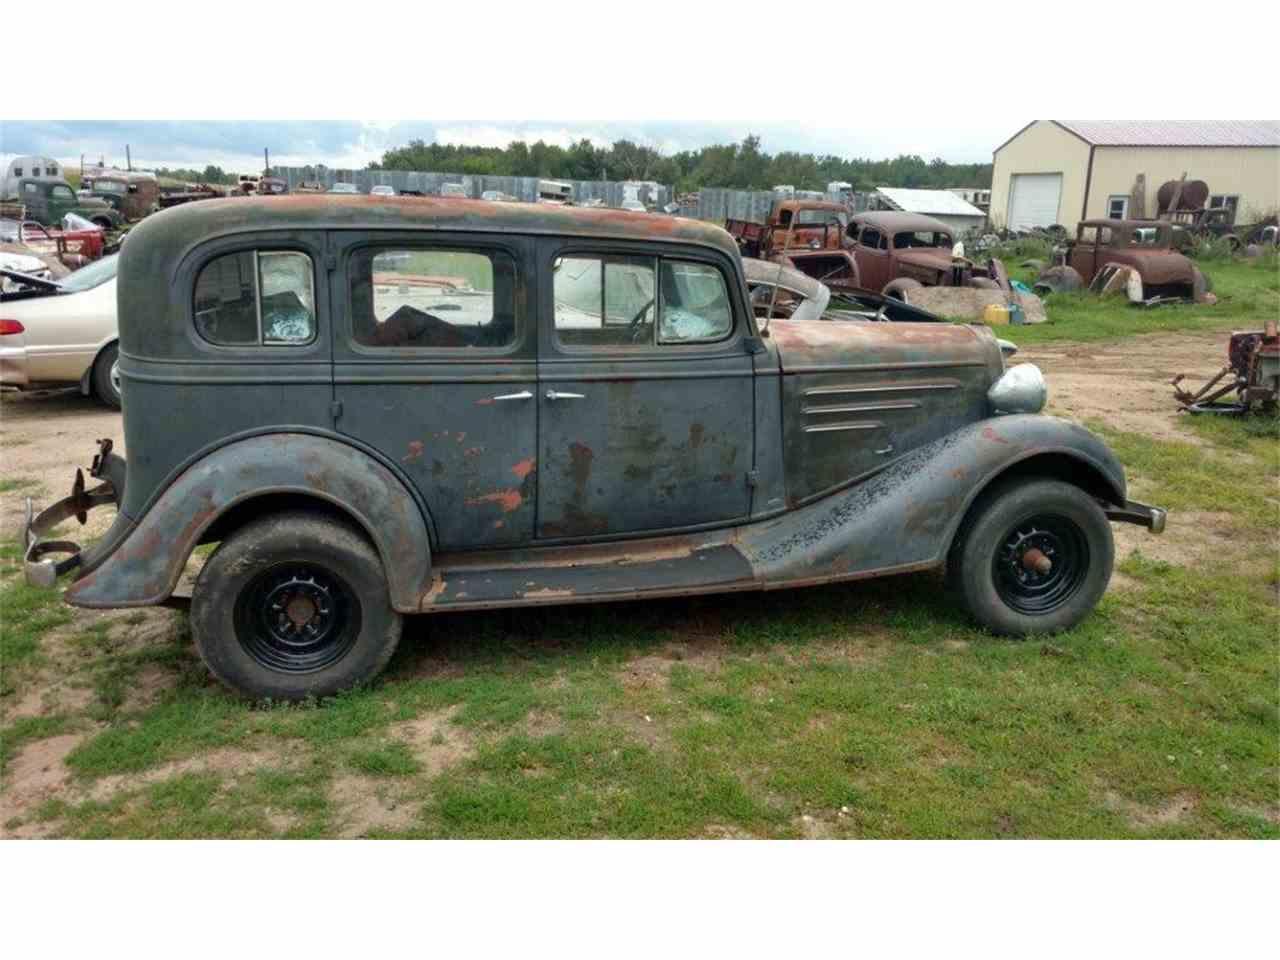 Sedan 1933 chevy 4 door sedan old chevy photos for 1933 dodge 4 door sedan for sale